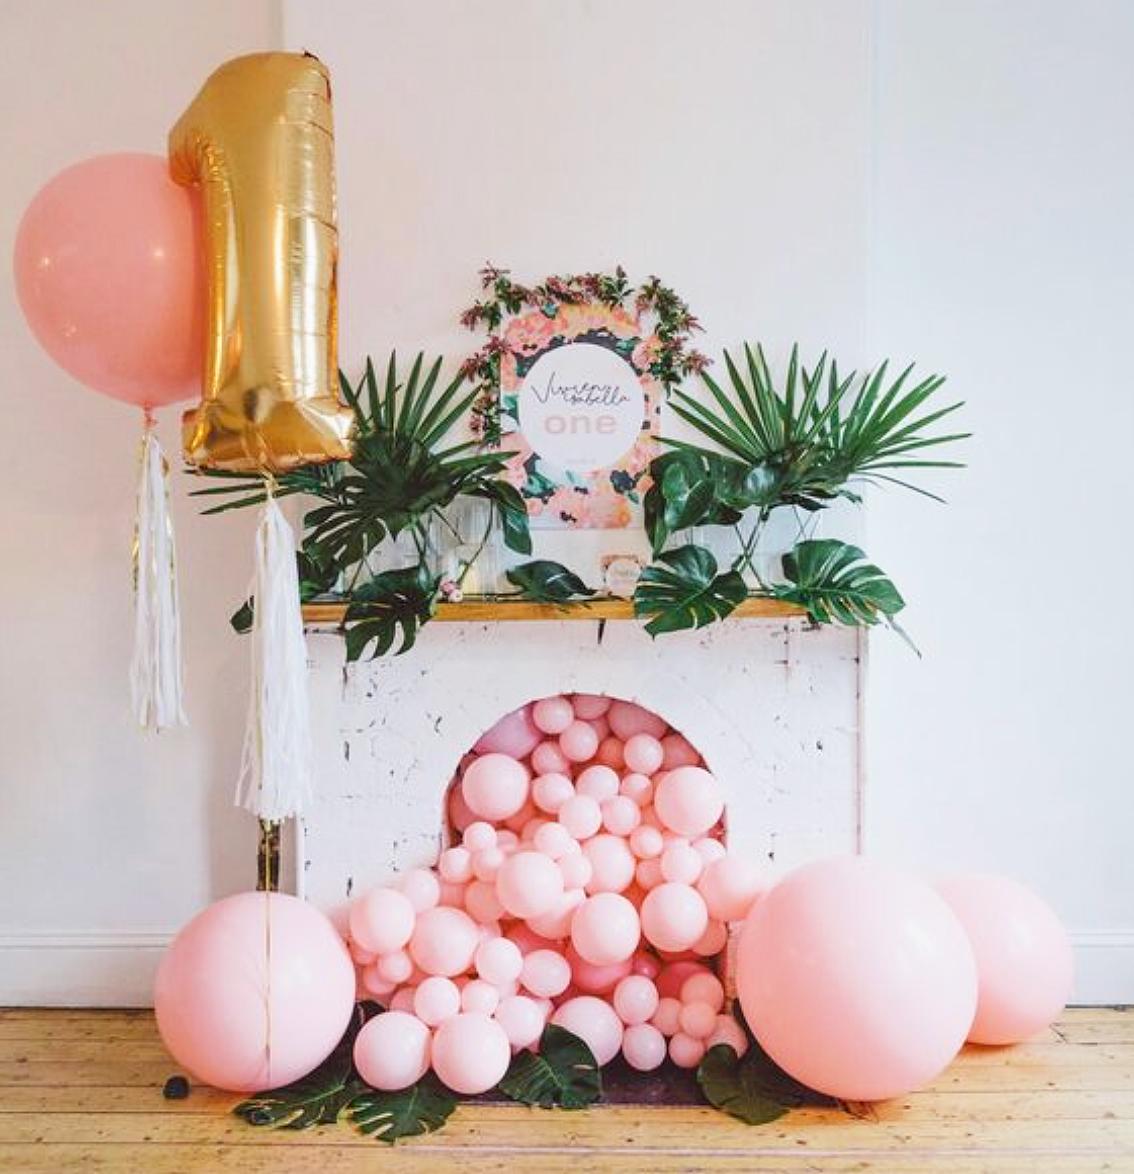 eventmates-blog-balloons-1.jpg